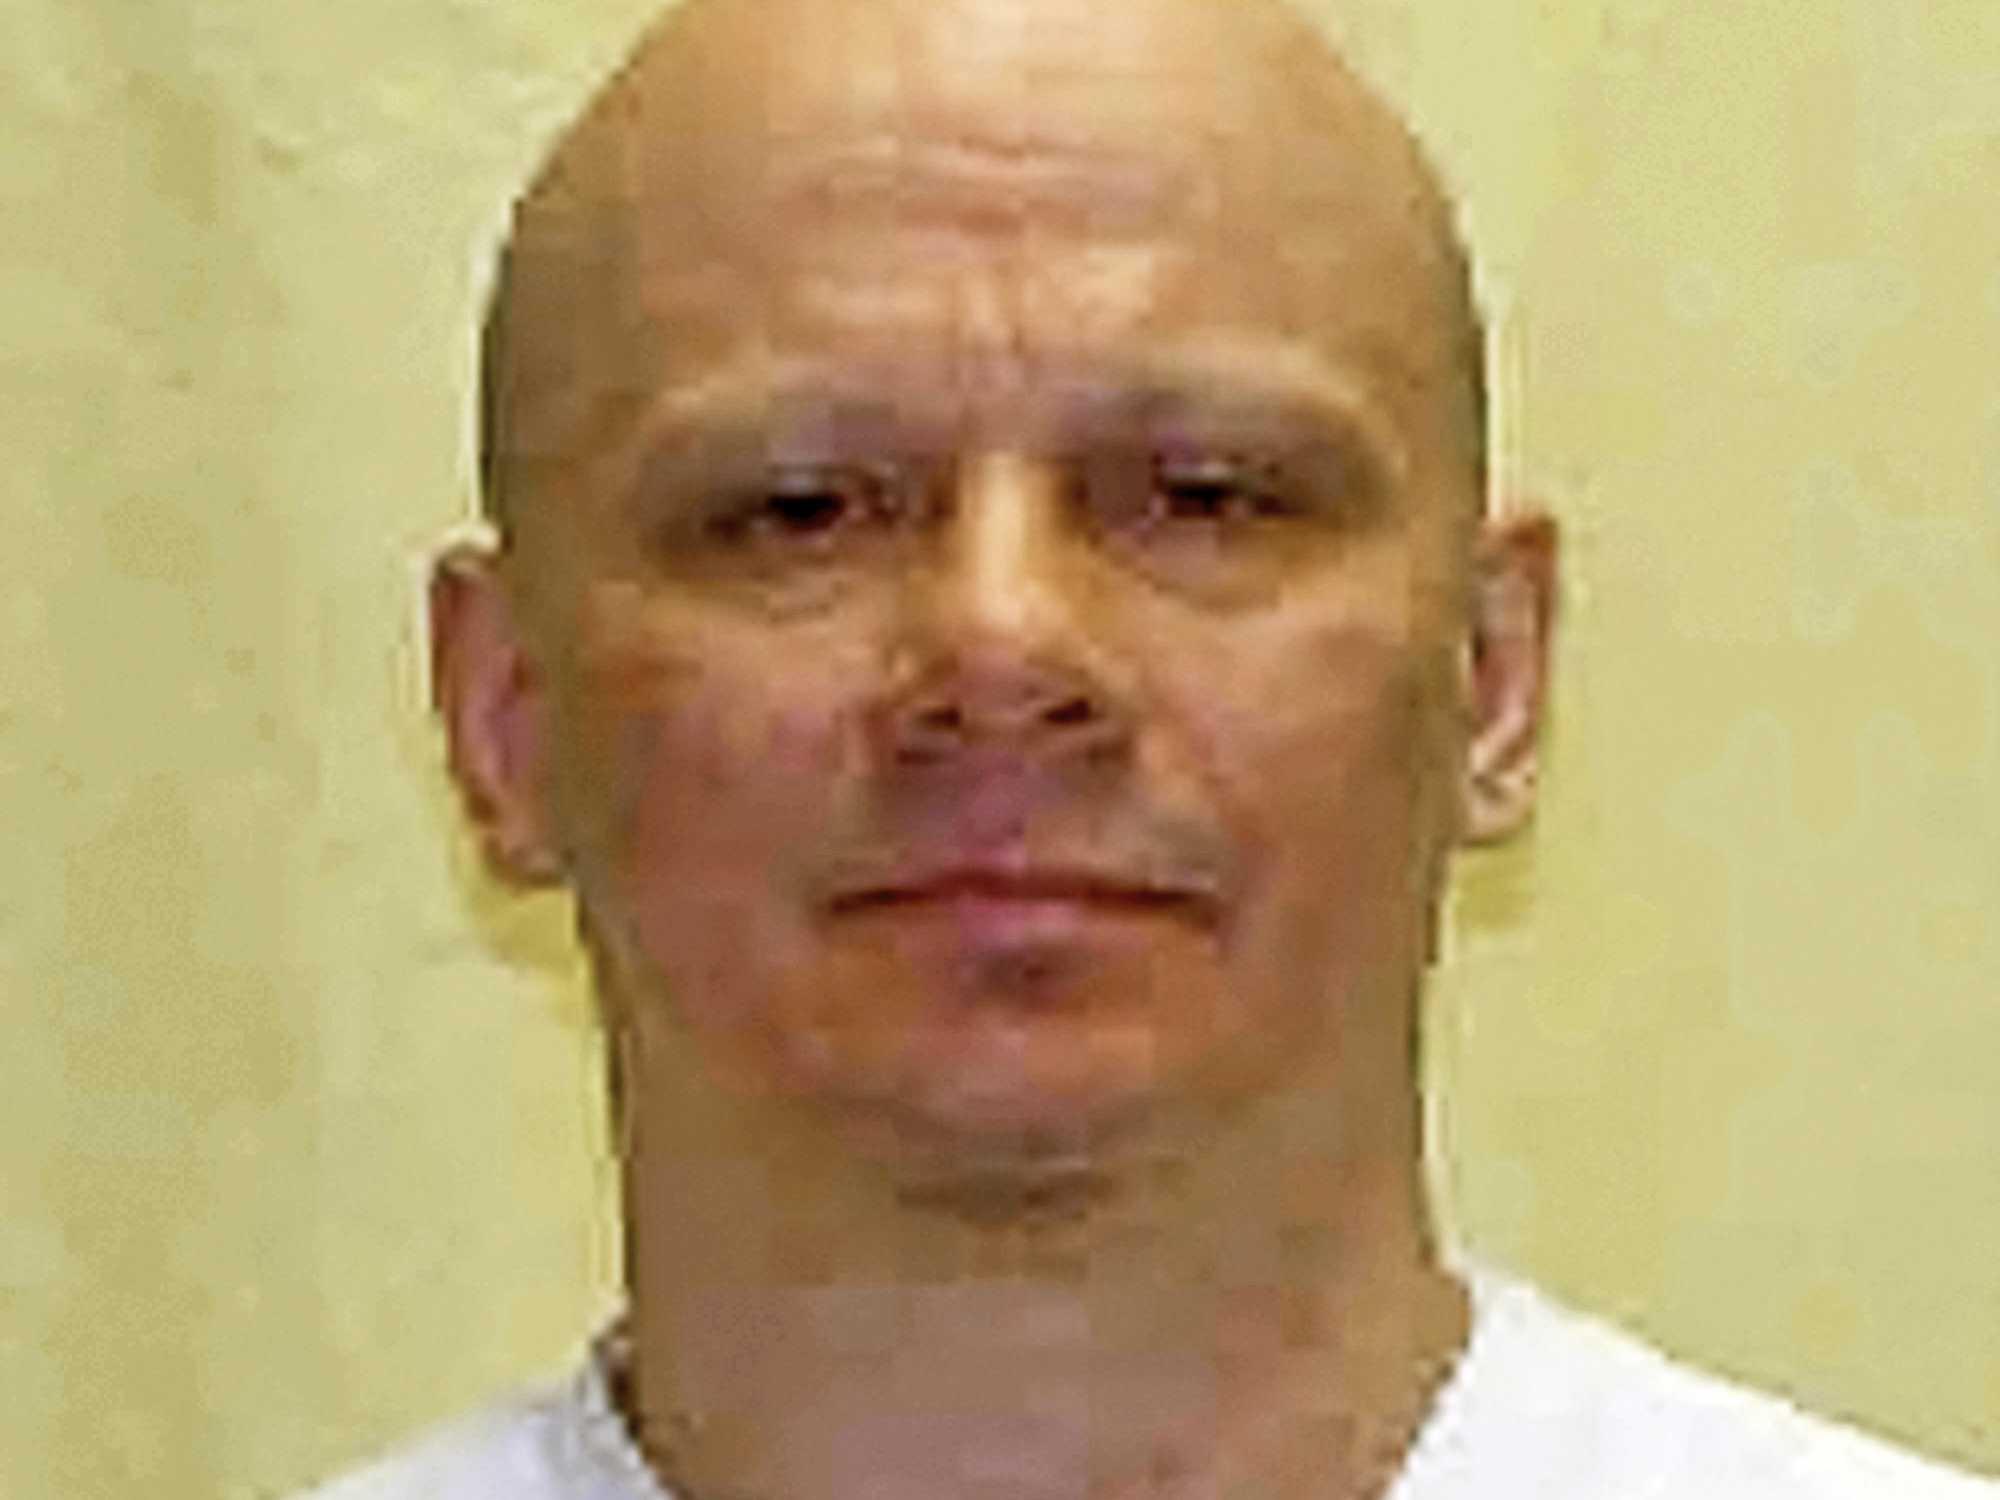 Ohio Prison Staff Set to Execute Killer of Man Met in Bar